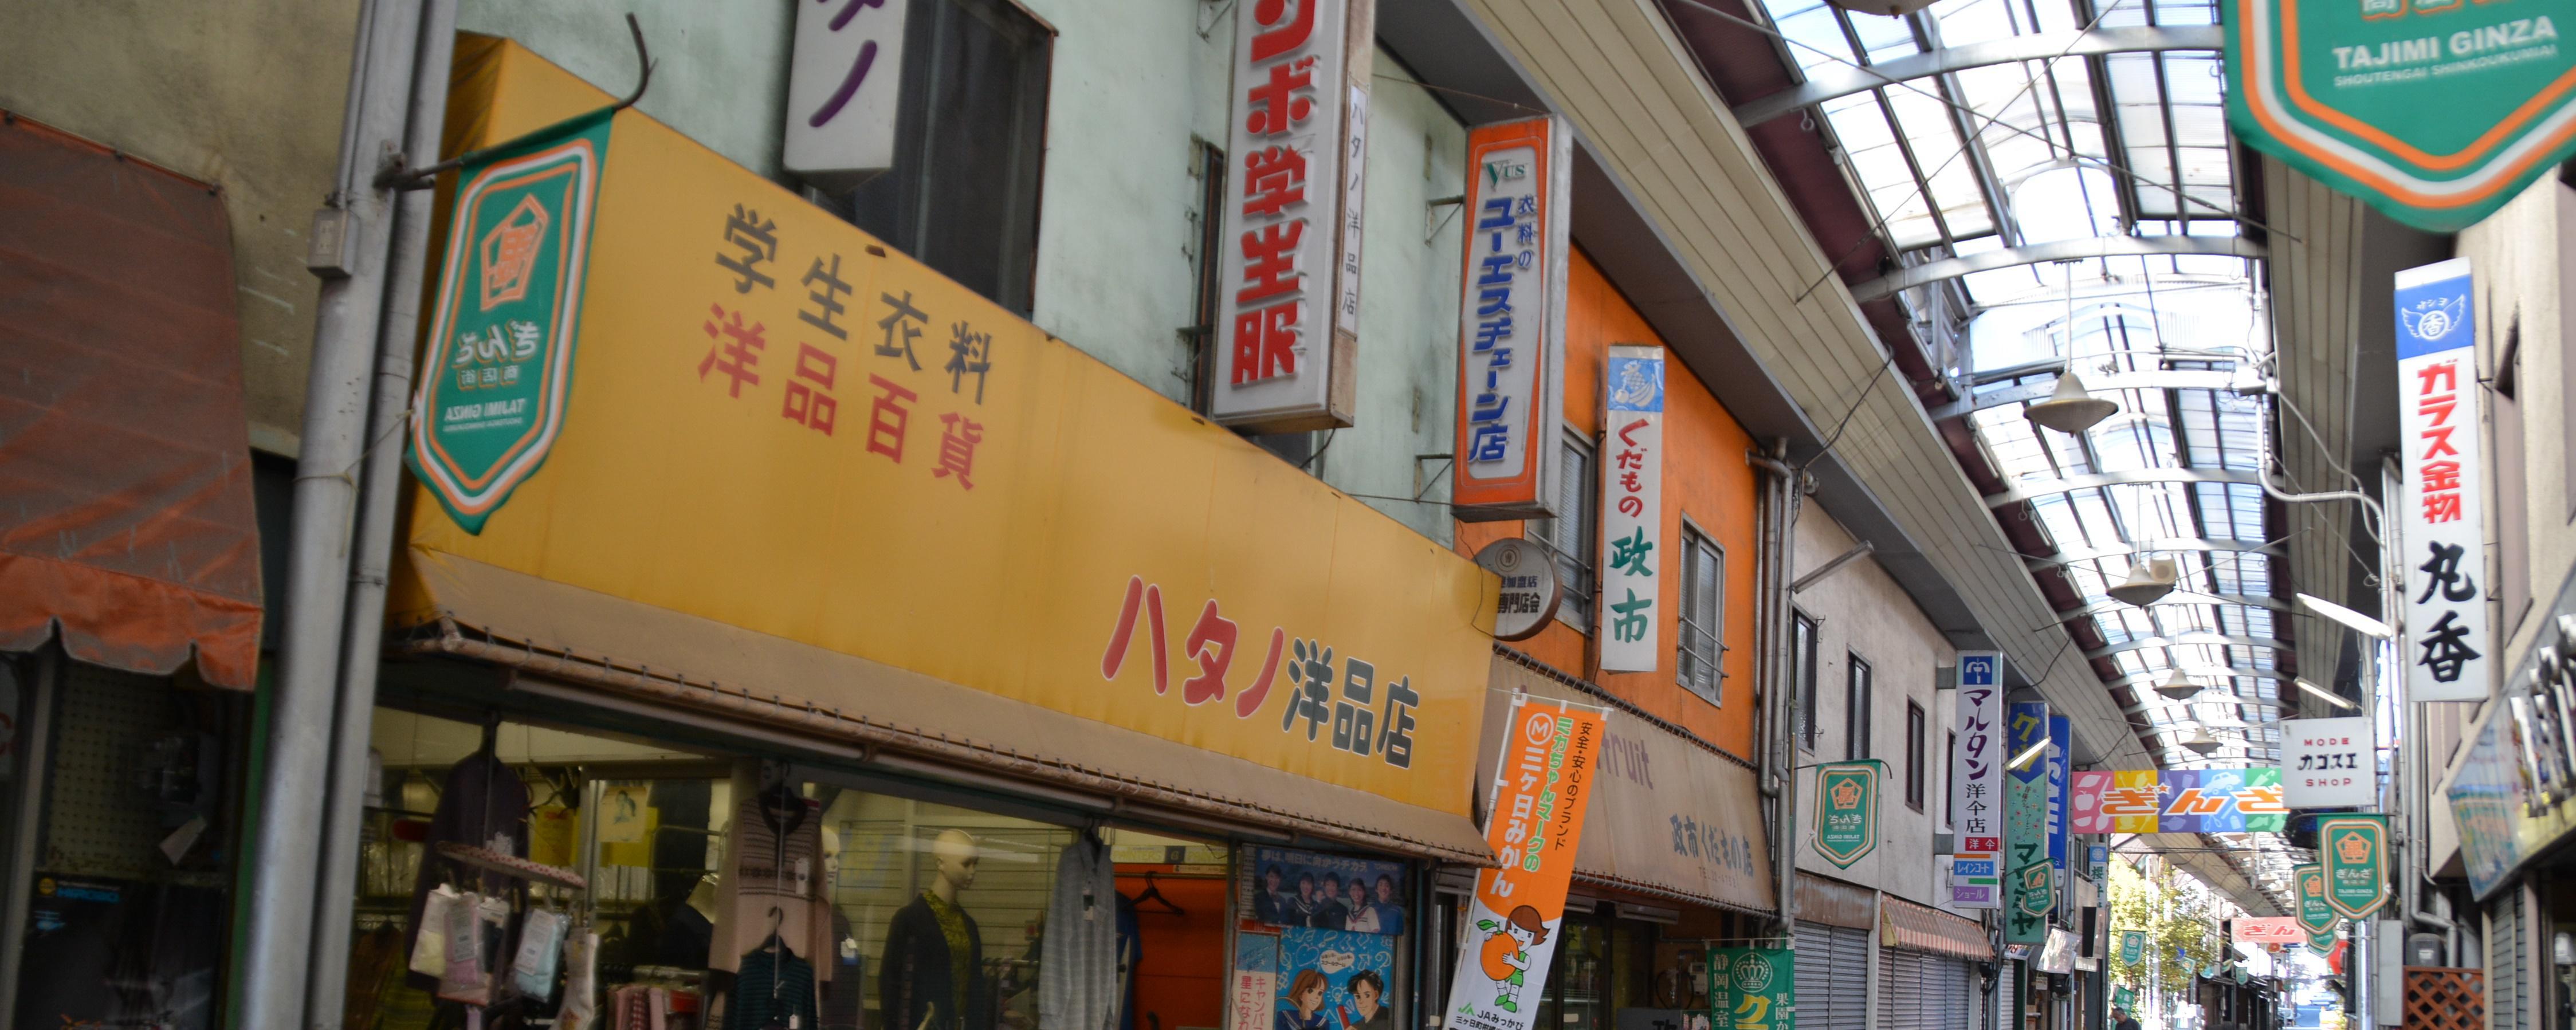 商店街03